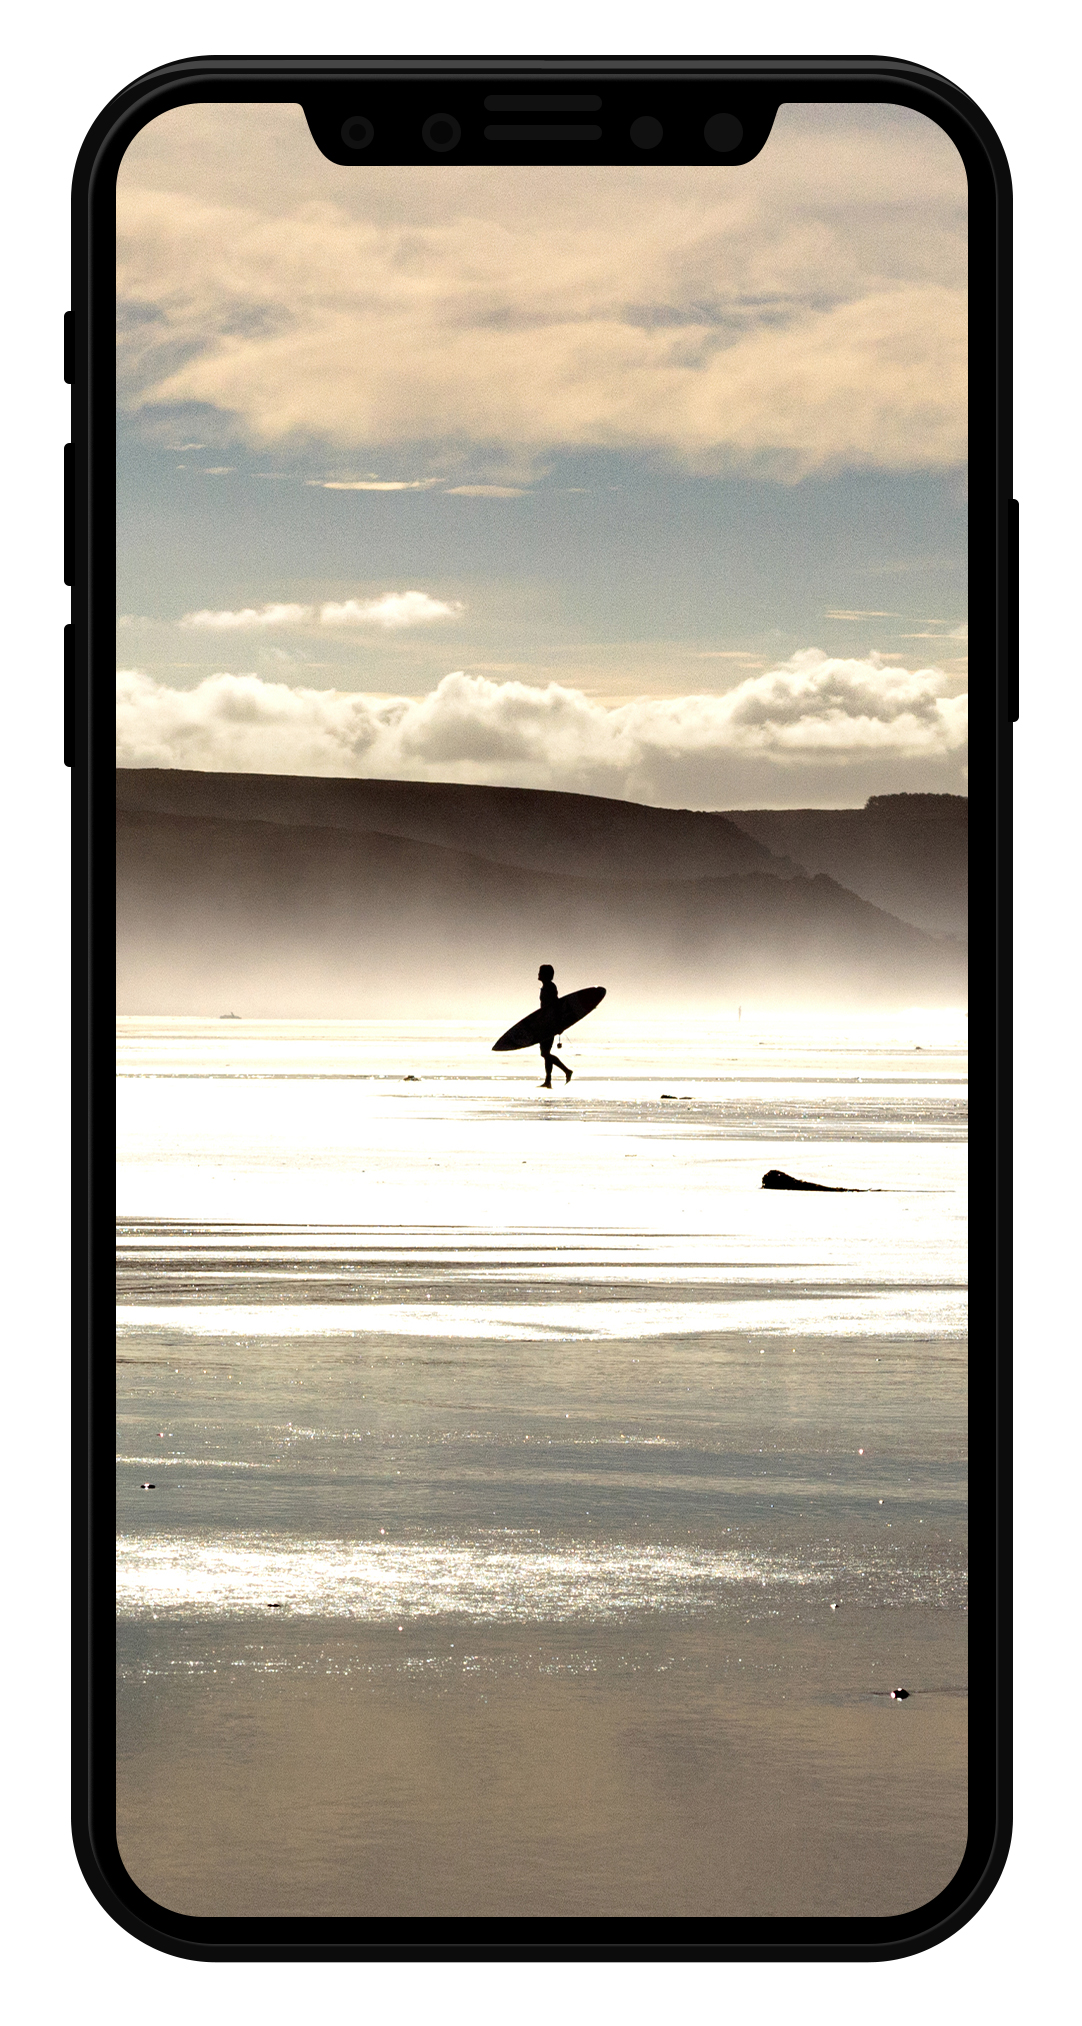 iphone-8-mockup-downloadabggfle.jpg